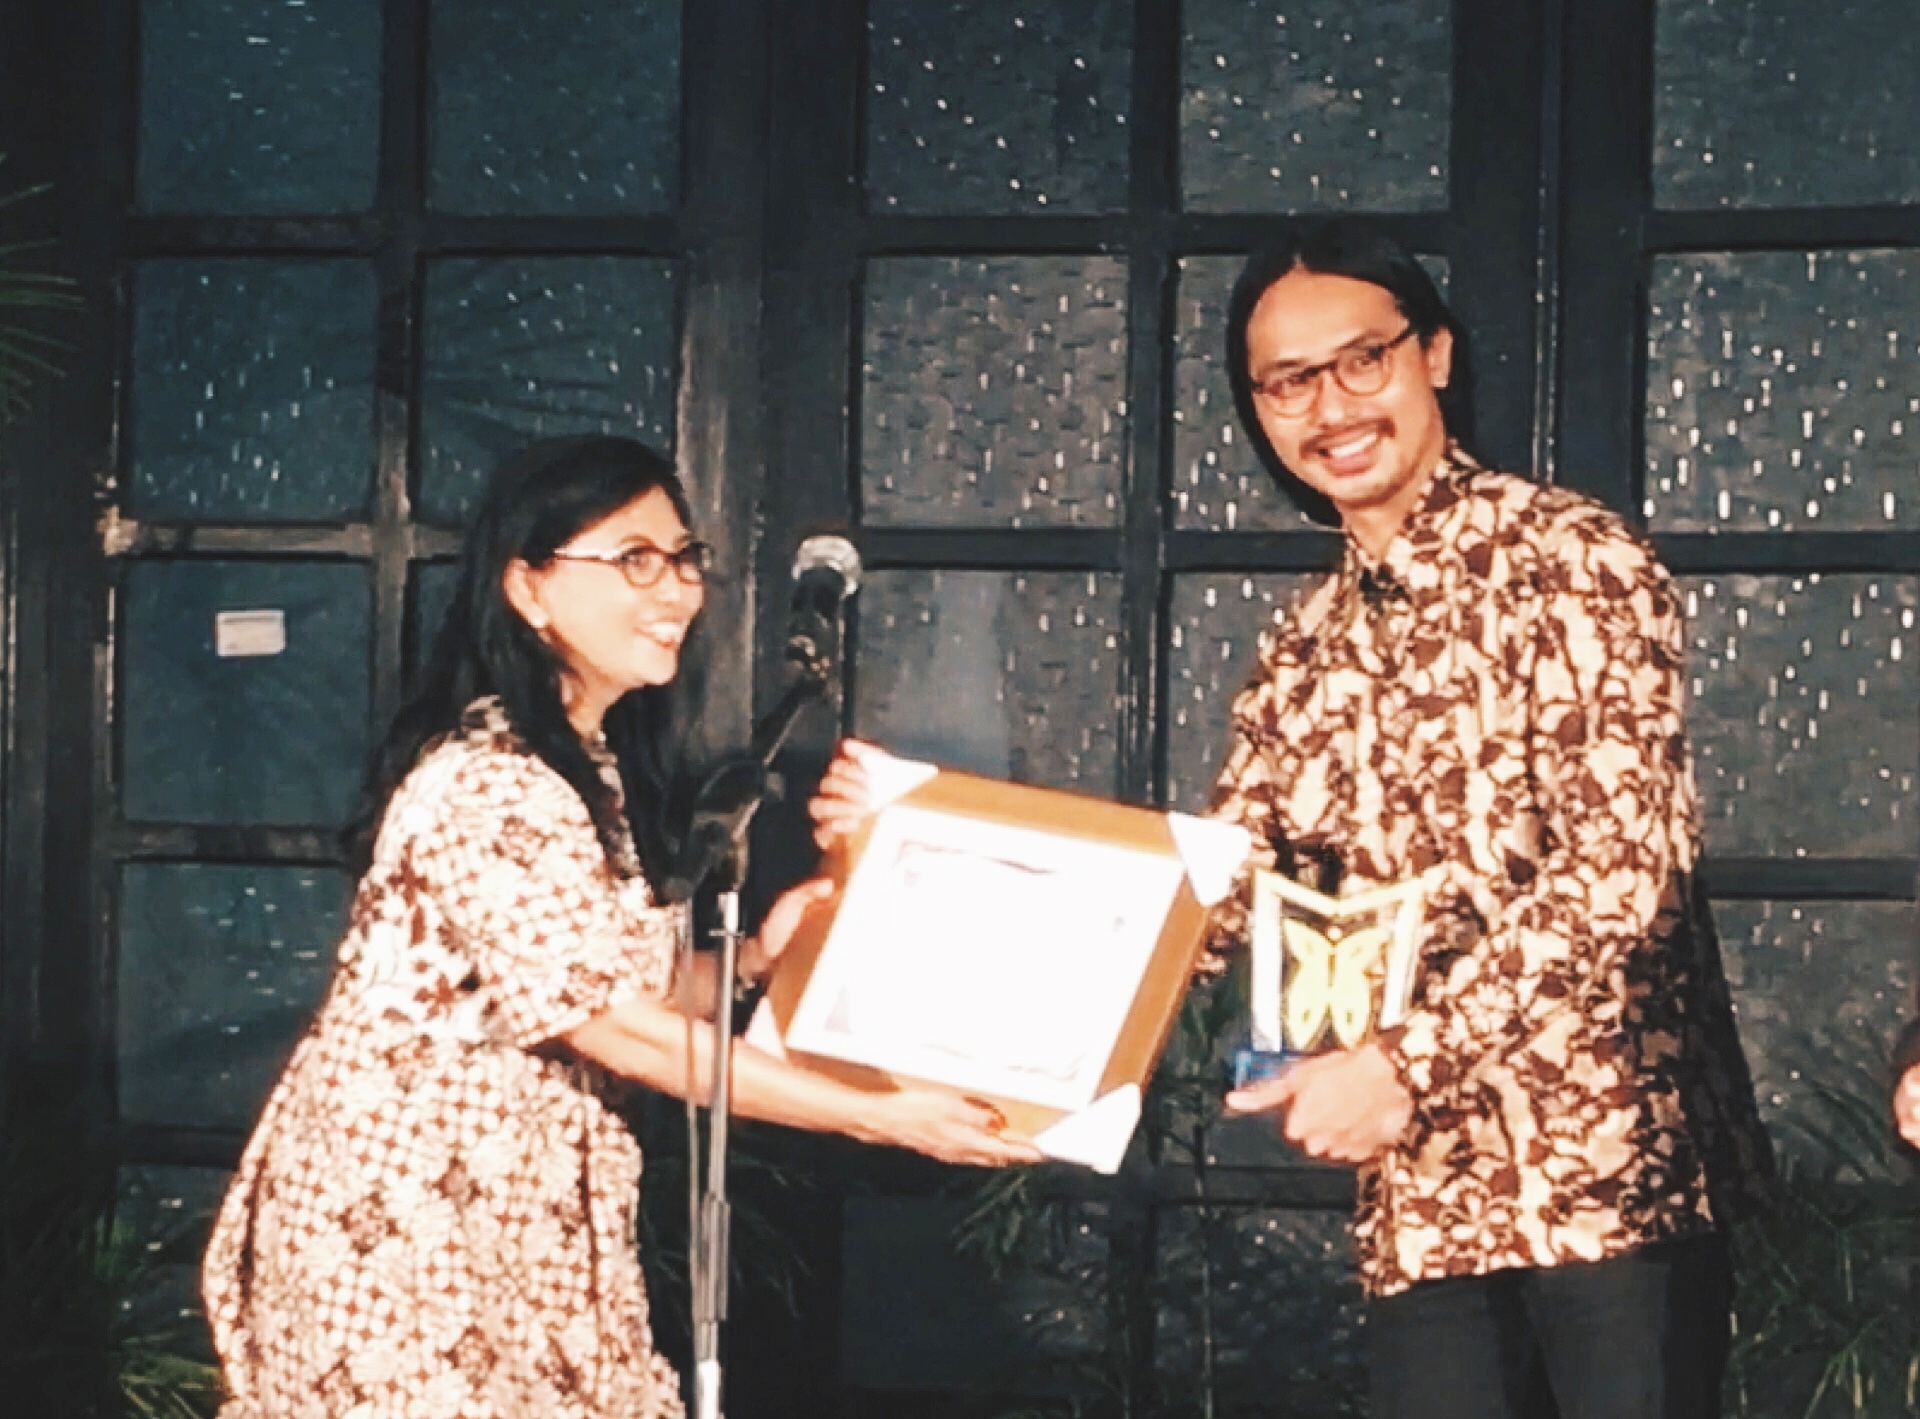 Anggiea Prawira Tjong, cicit dari Tjong A Fie yang menerima penghargaan tersebut atas nama seluruh keluarga besar Tjong A Fie